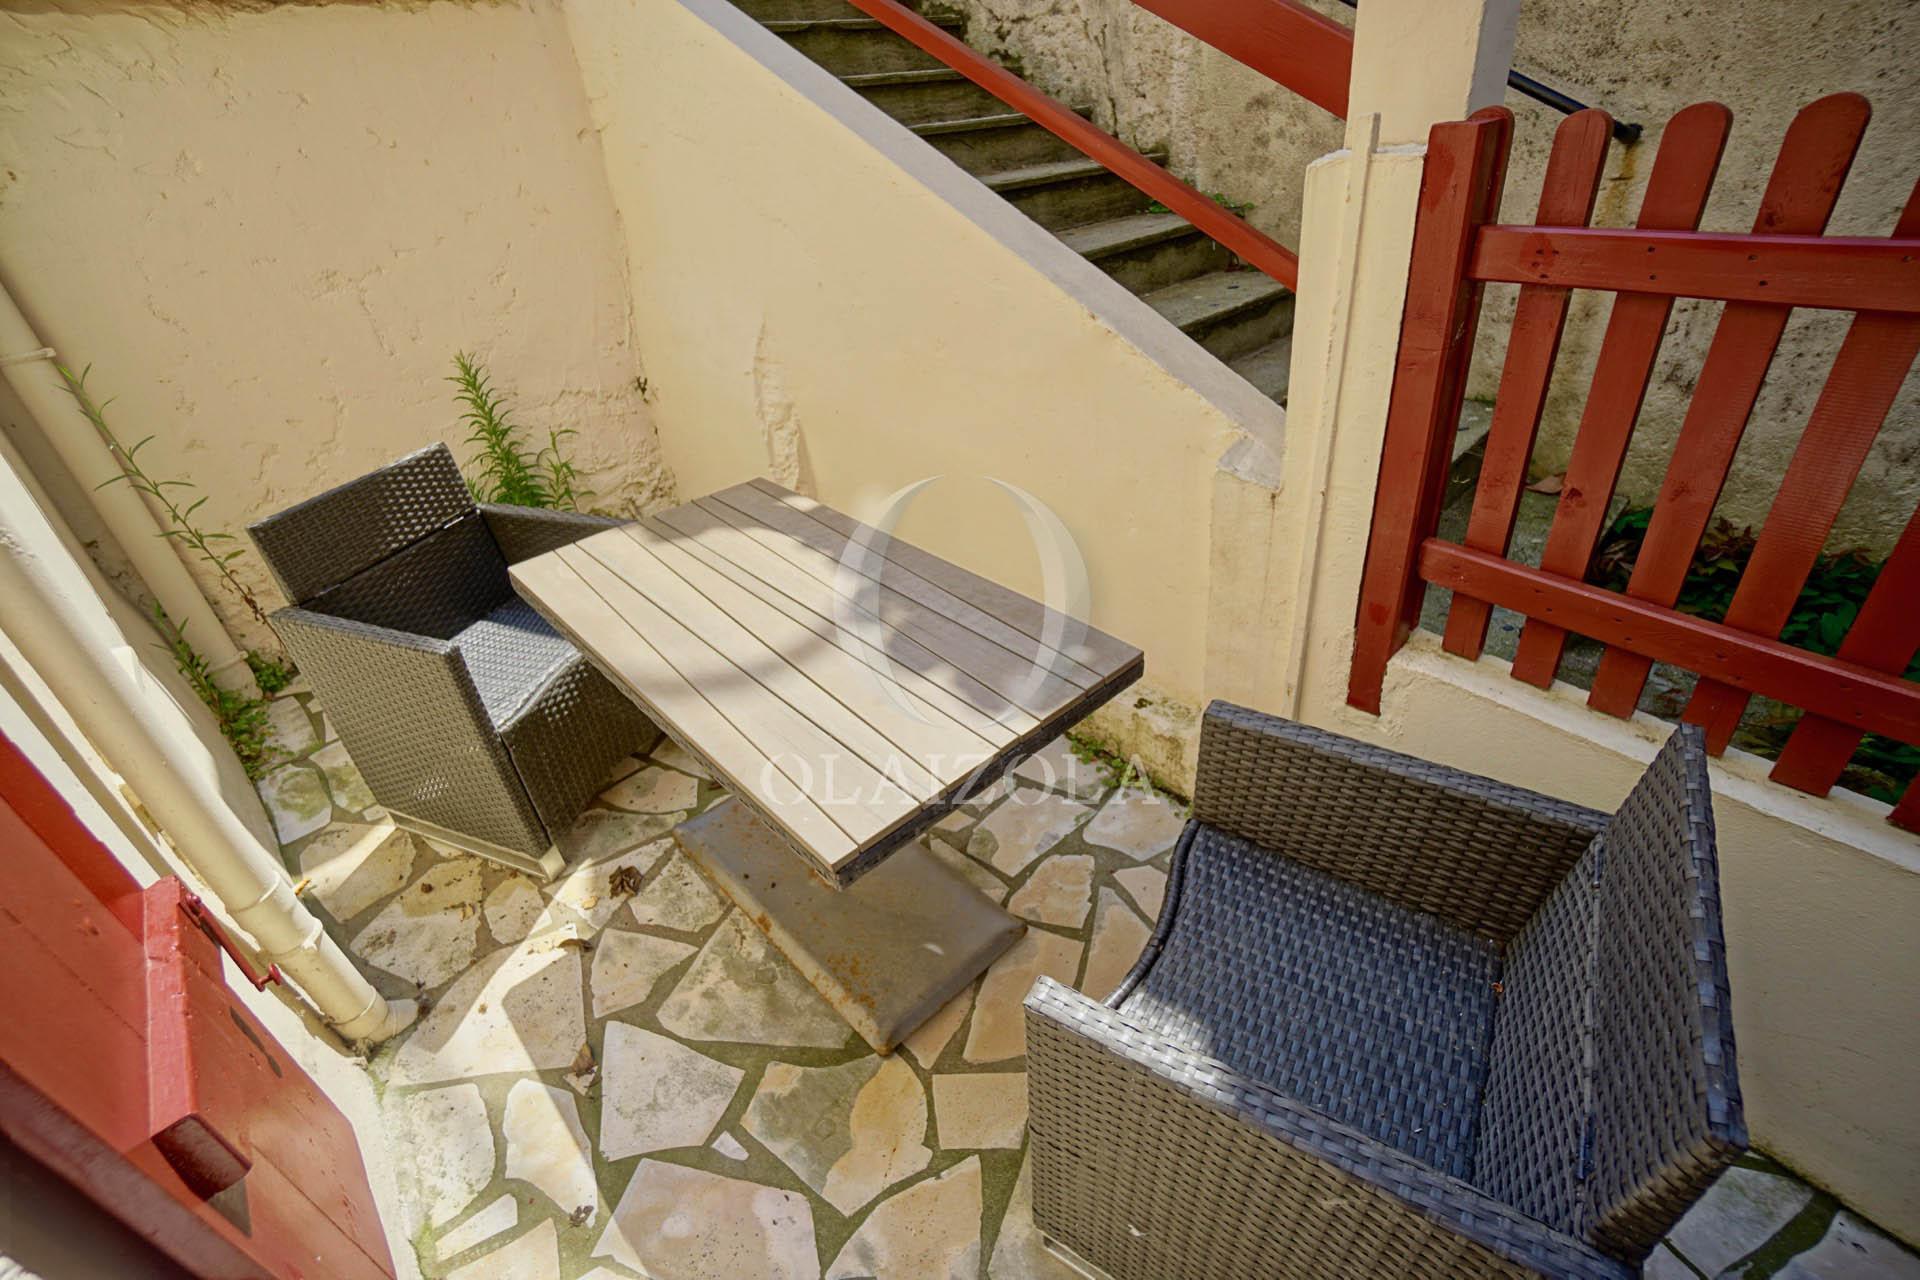 location maison biarritz le bon coin ventana blog. Black Bedroom Furniture Sets. Home Design Ideas